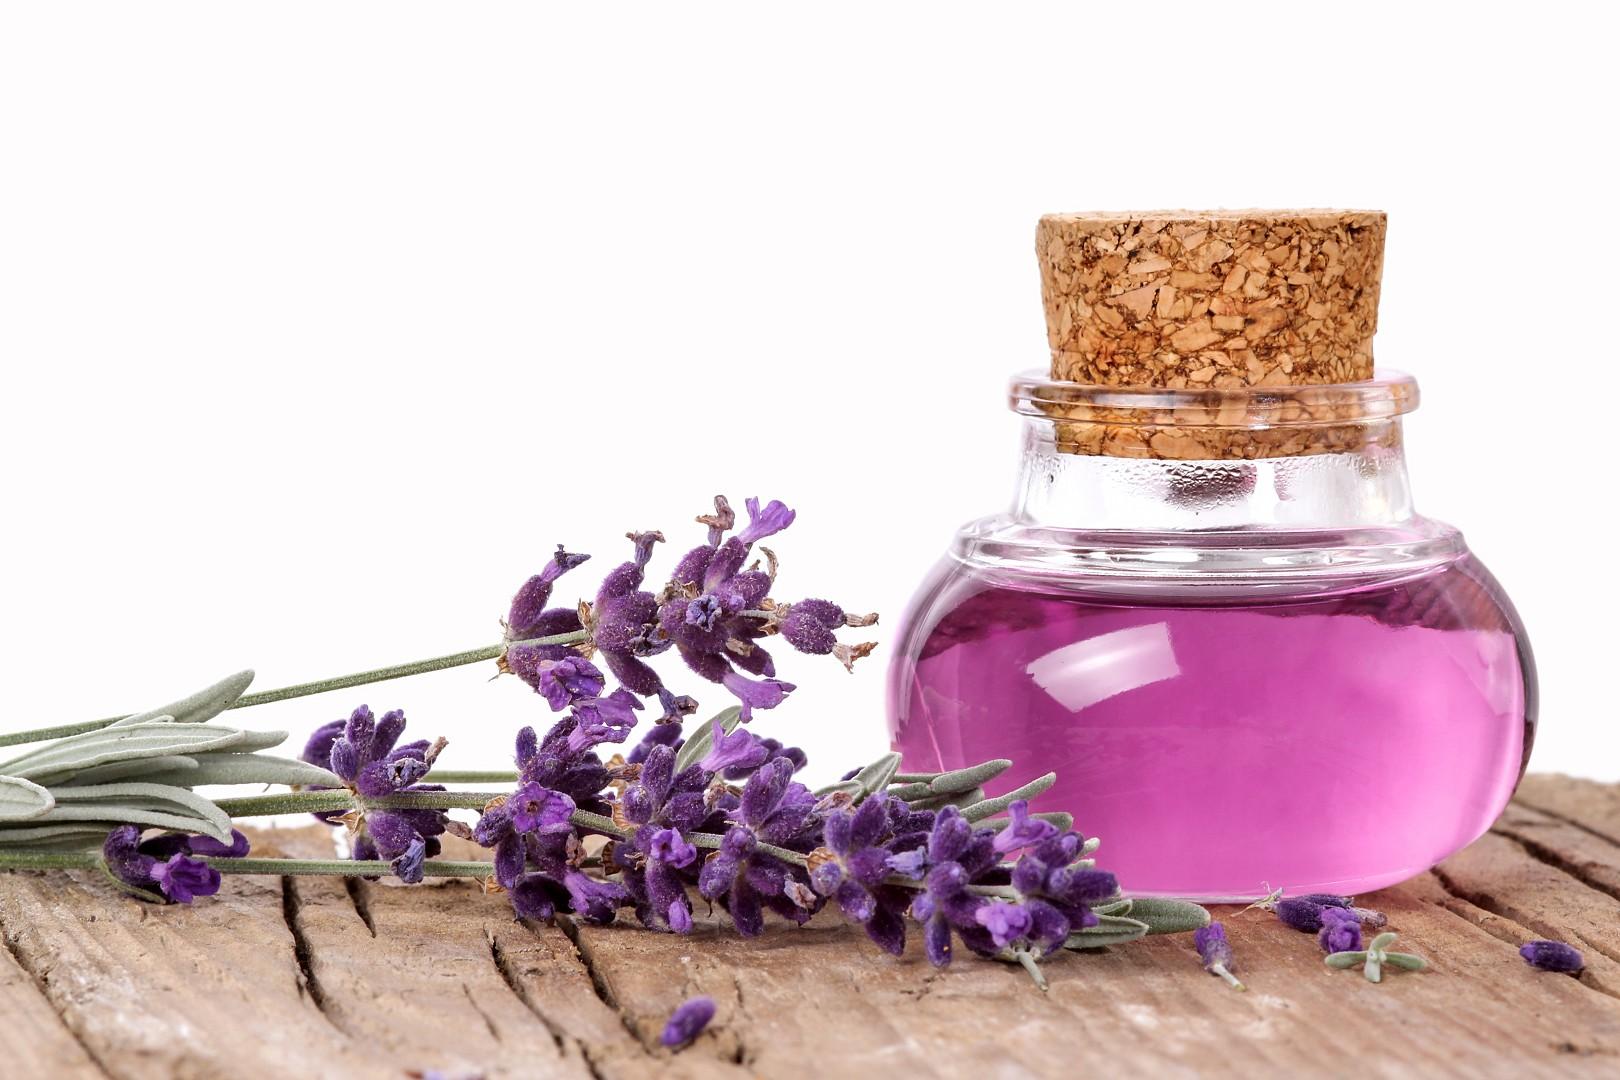 فواید دمنوش گیاه لاوندر یا اسطوخودوس lavender